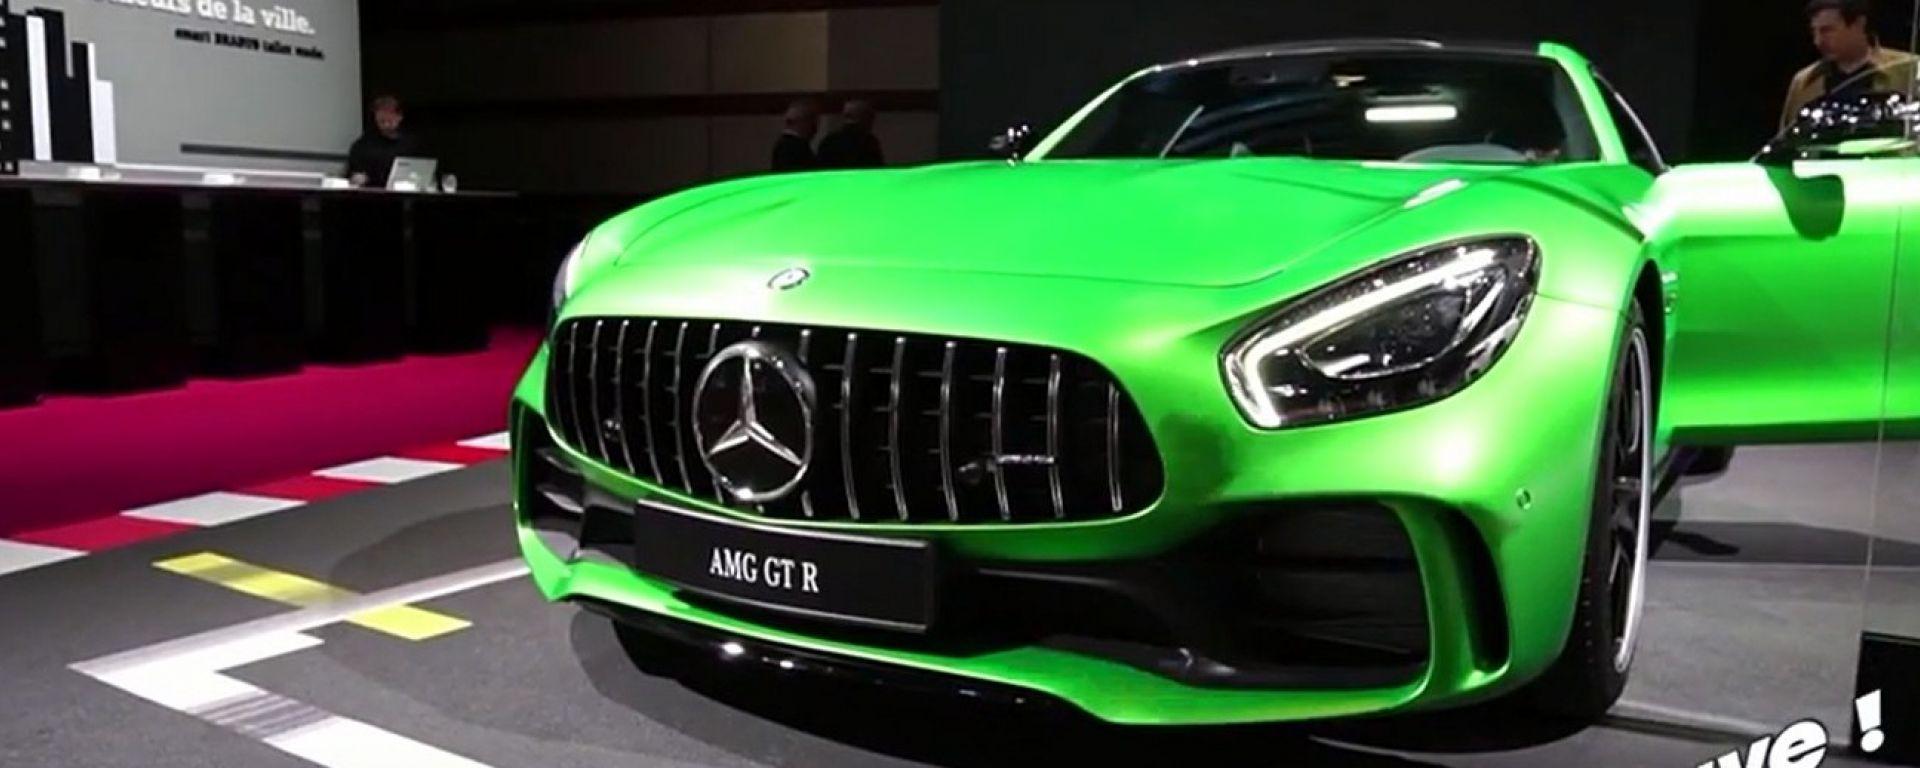 Live Parigi 2016: Mercedes AMG GT R ed EQ Concept in video